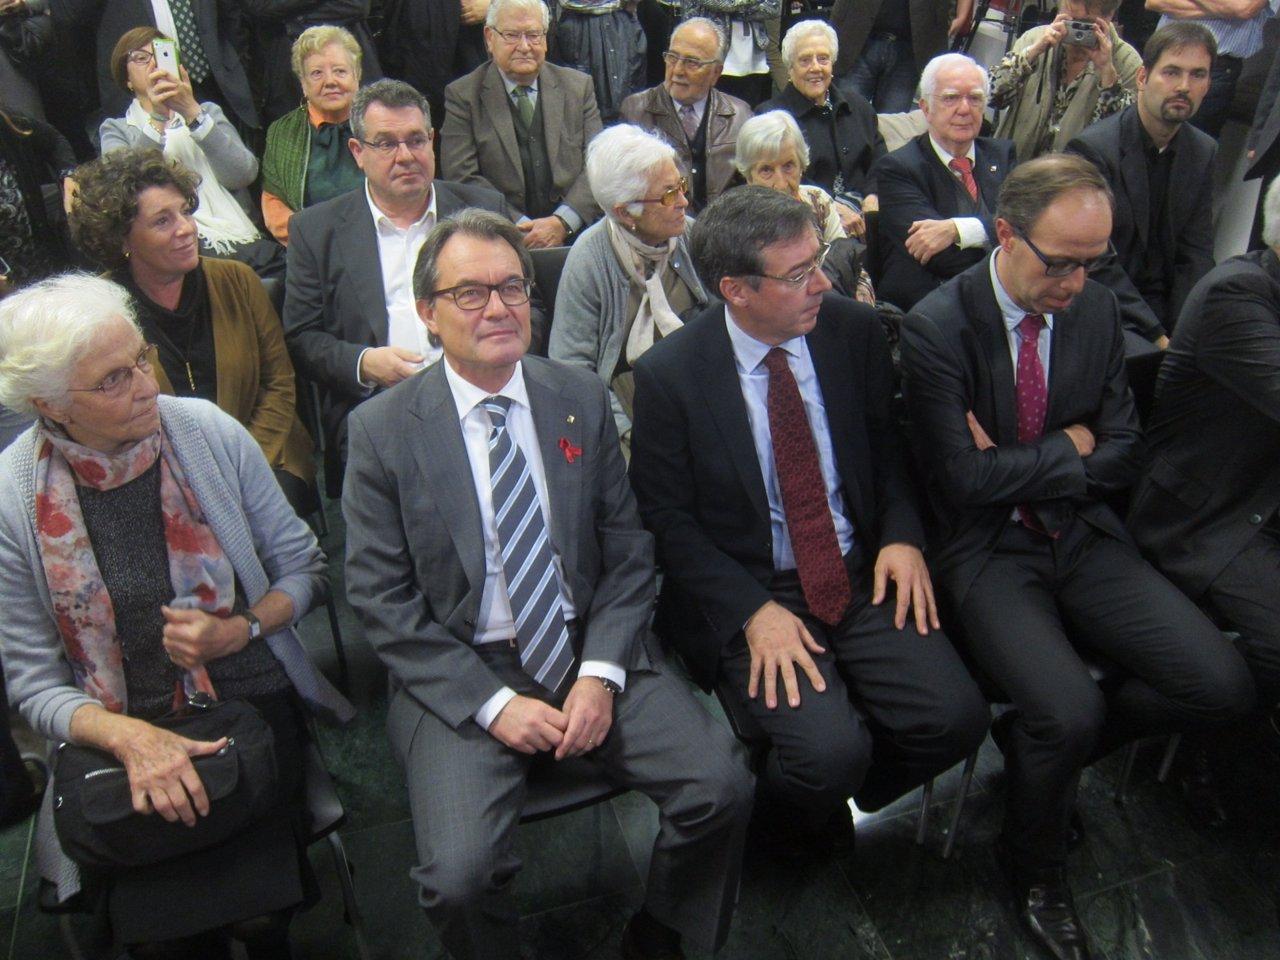 El pte.De la Generalitat, Artur Mas, y el director de CatDem, Joaquim Colominas